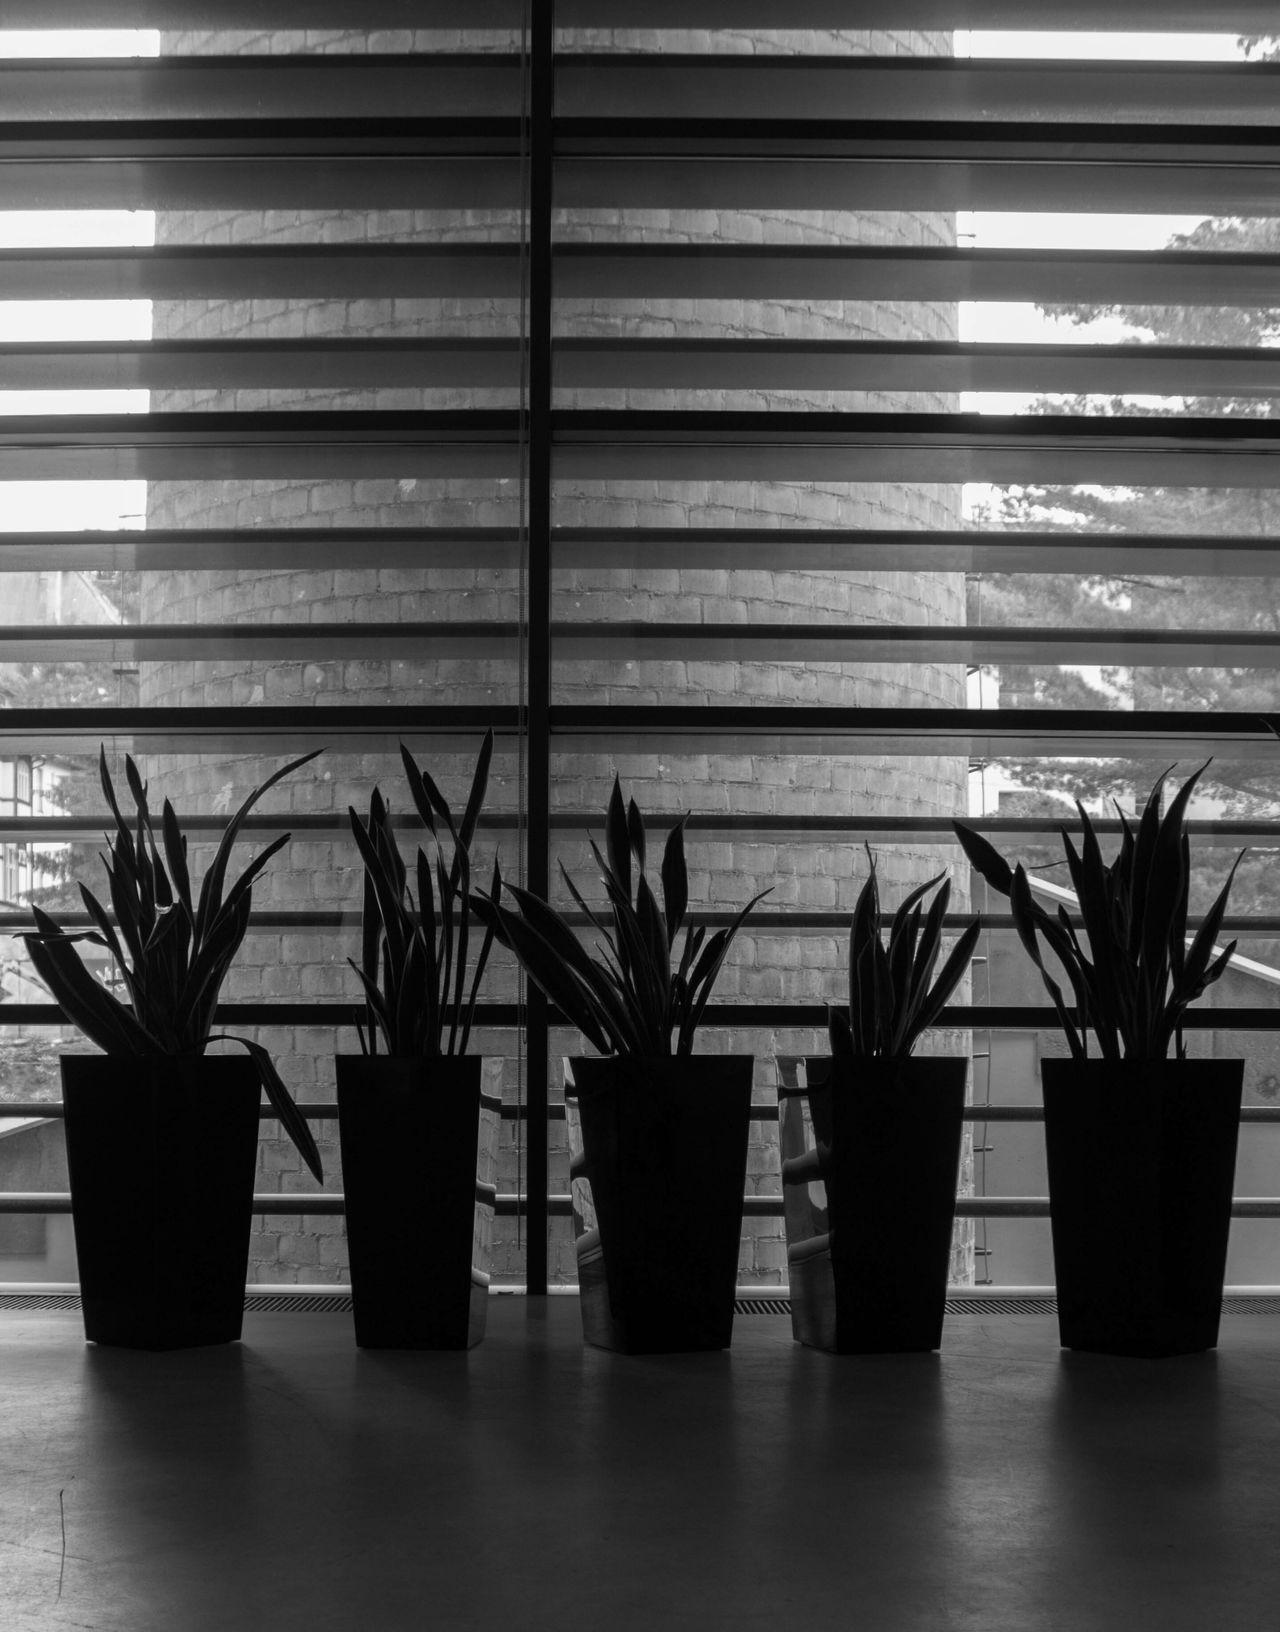 Indoors  No People Illuminated Architecture Day Minimalism Minimal Minimalobsession Minimalistic Minimalmood Minimalist Photography  Blackandwhite Black And White Black & White Blackandwhite Photography Black And White Photography Black&white Black And White Collection  Plants Plant Plant Life Blackandwhitephoto